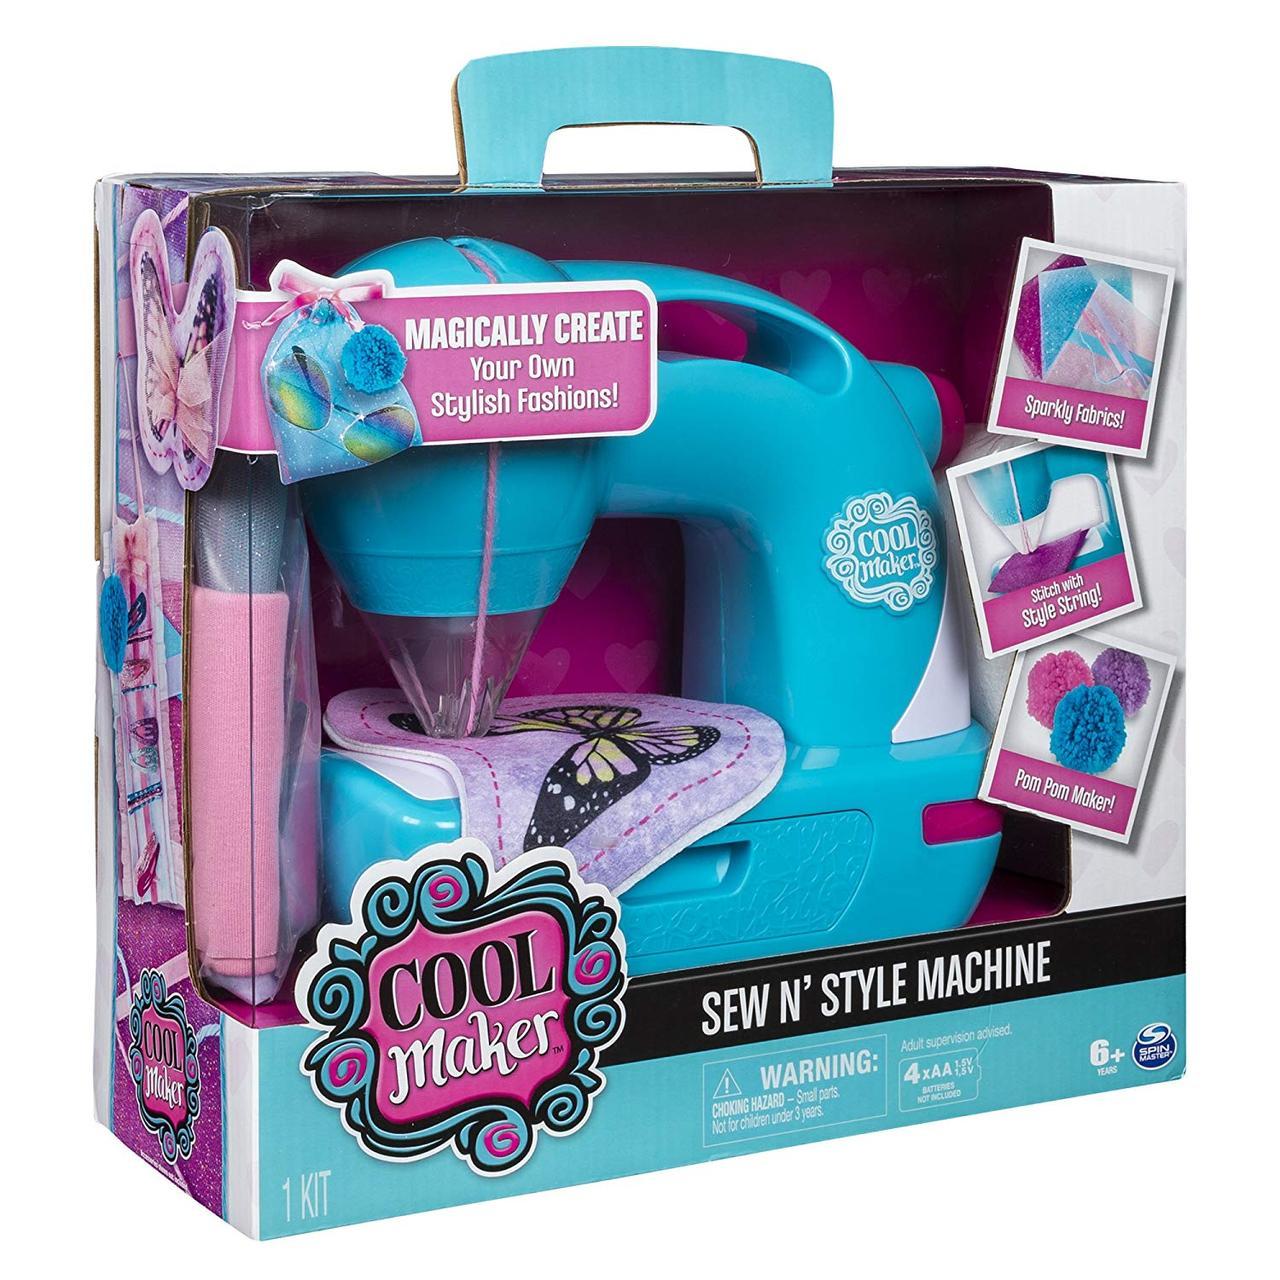 Cool Maker Швейная машинка Sew N Style Sewing Machine Pom-Pom Maker